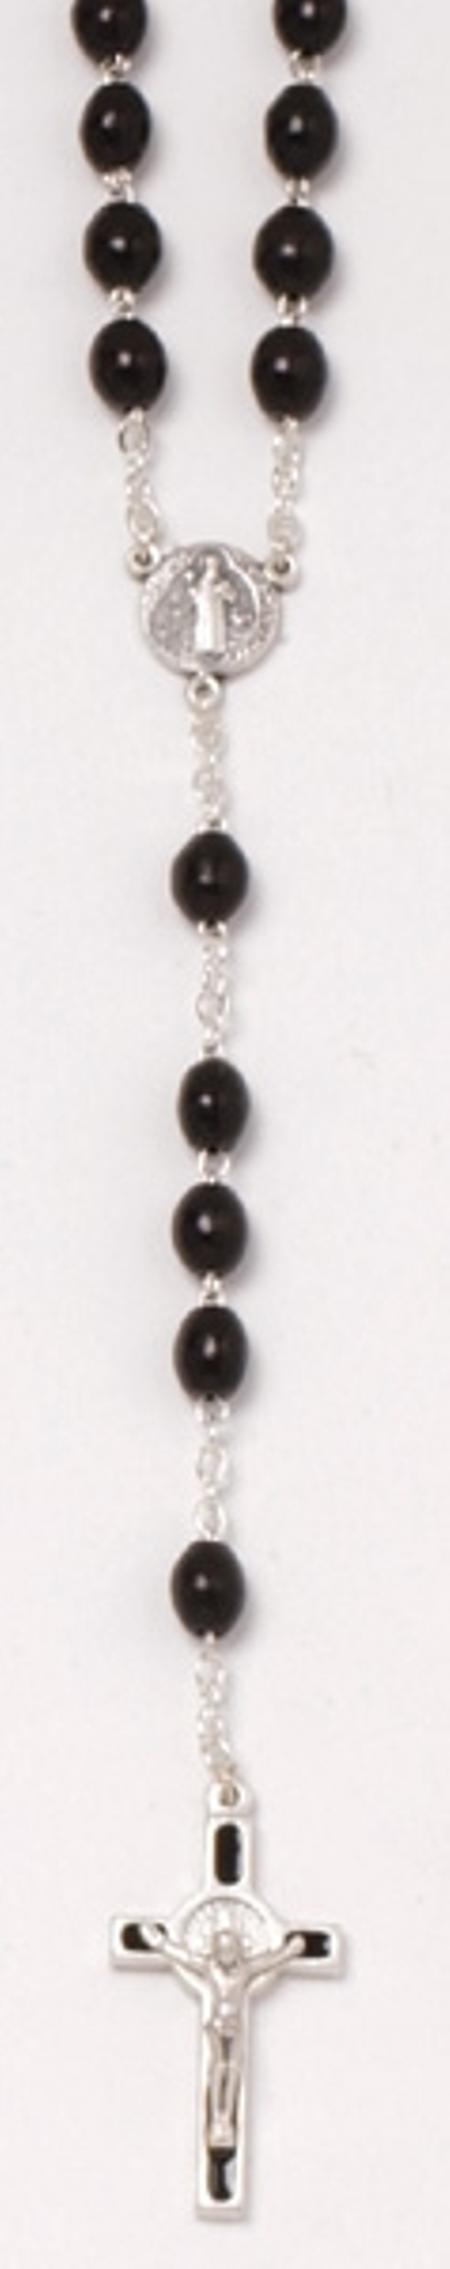 PATERNOSTER - zwart - hout - 52 cm